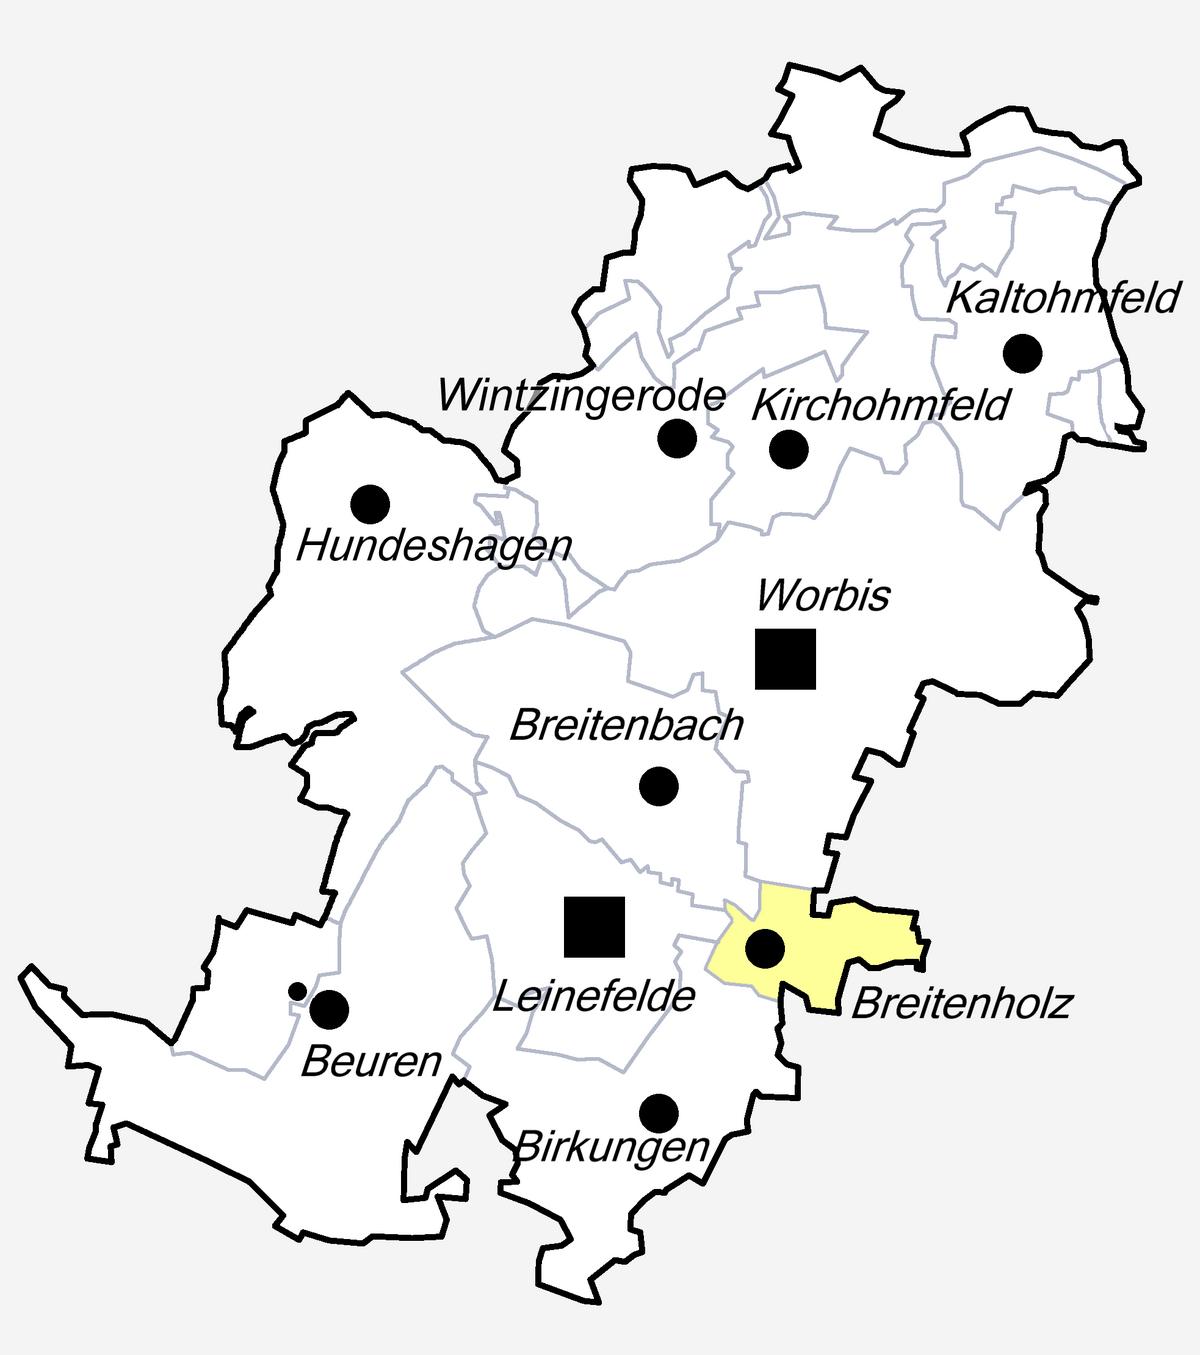 Leinefelde Worbis